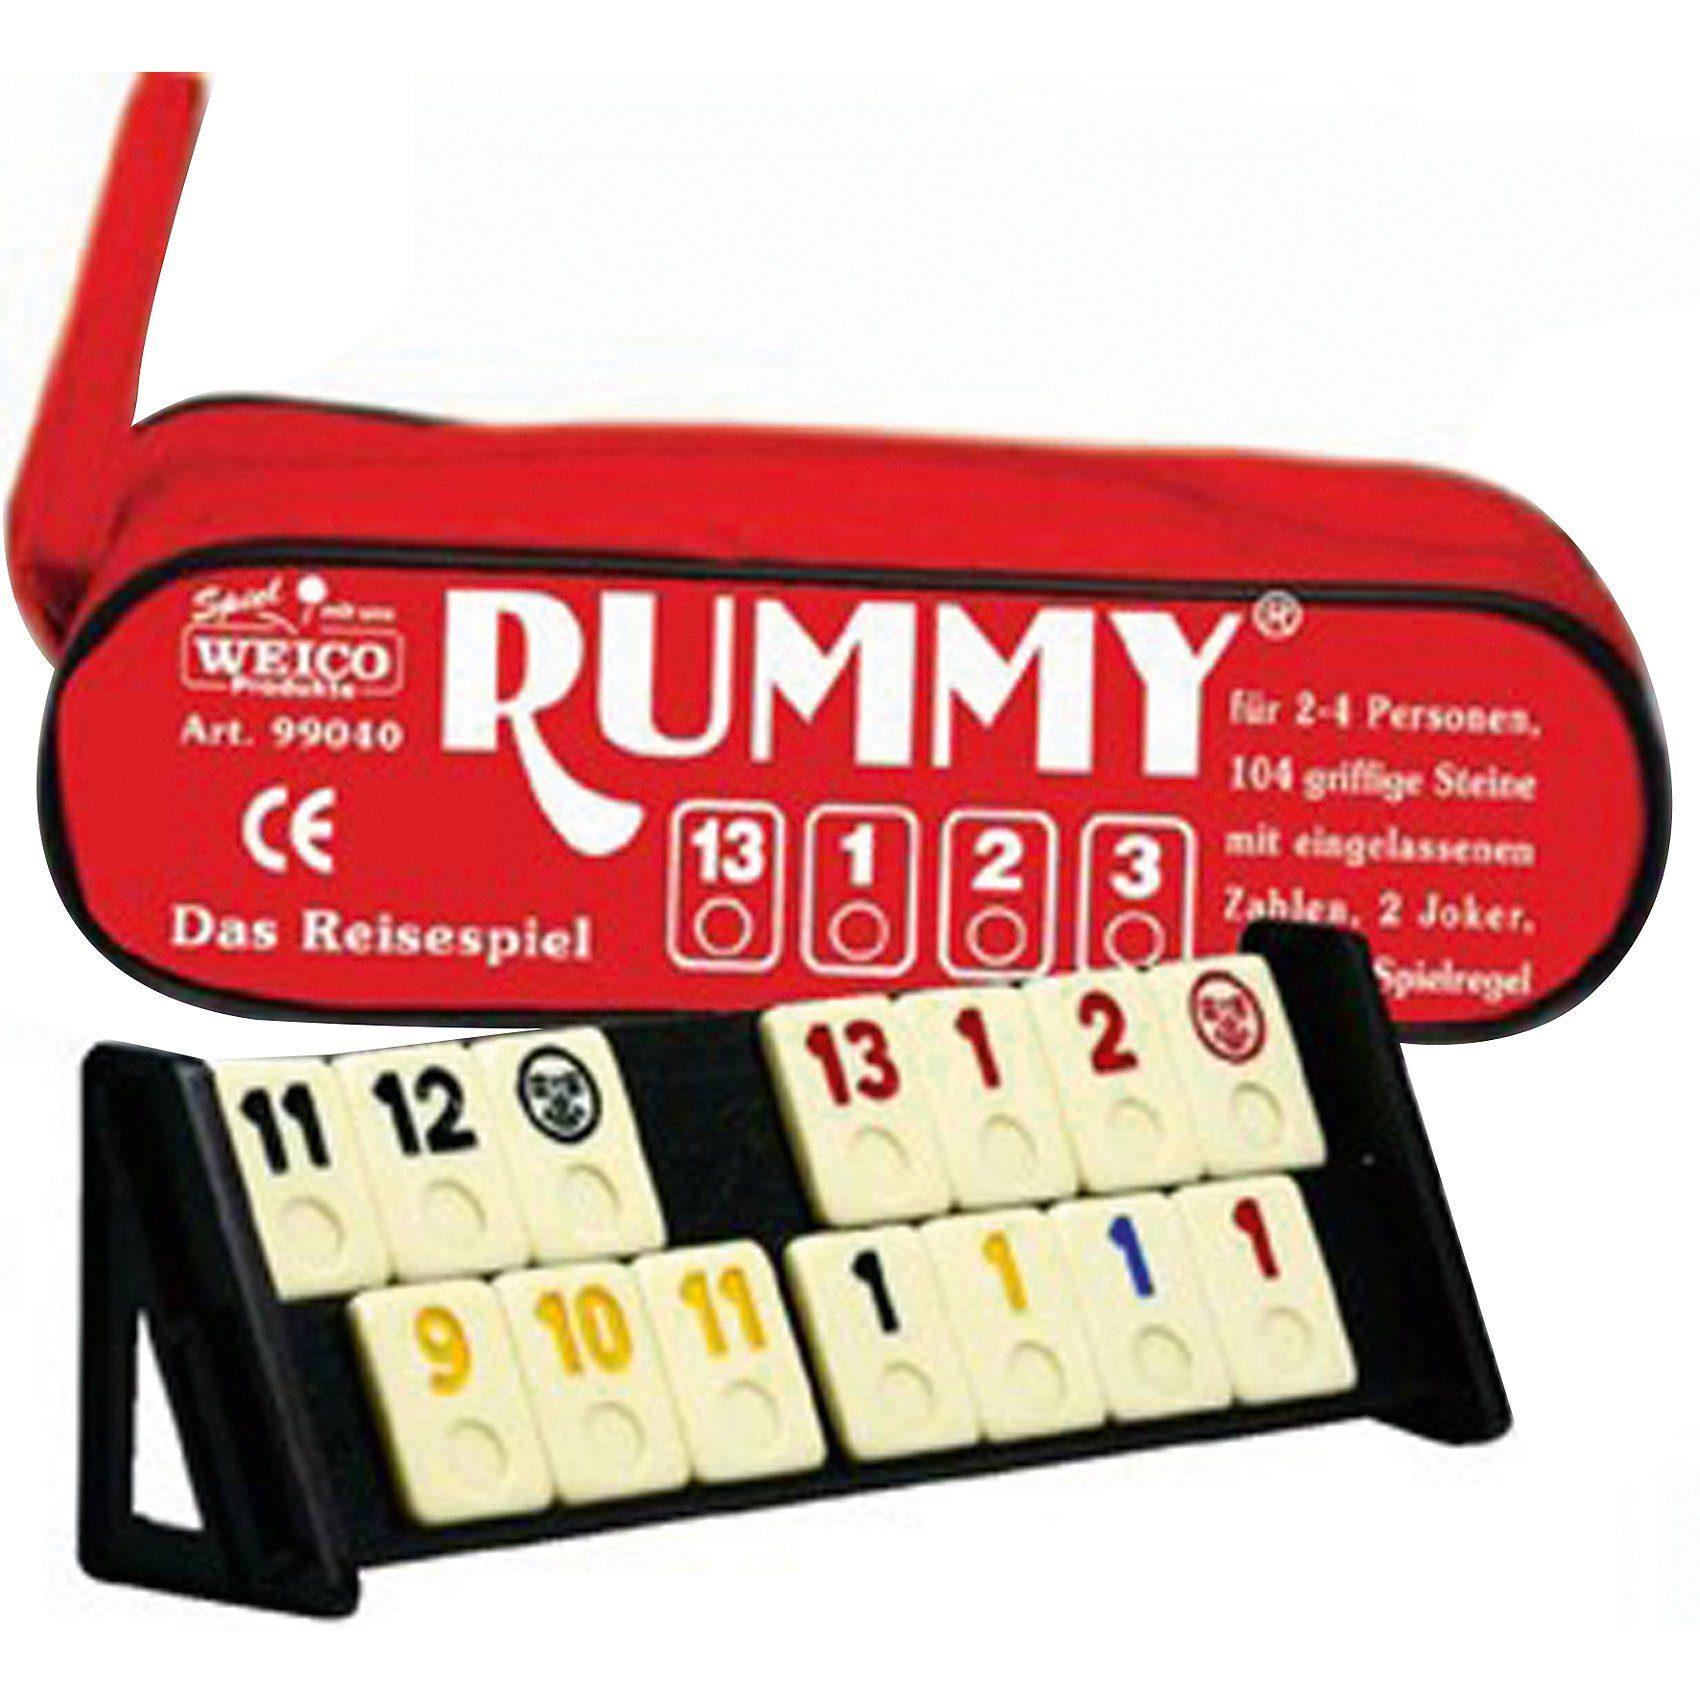 Reise-Rummy